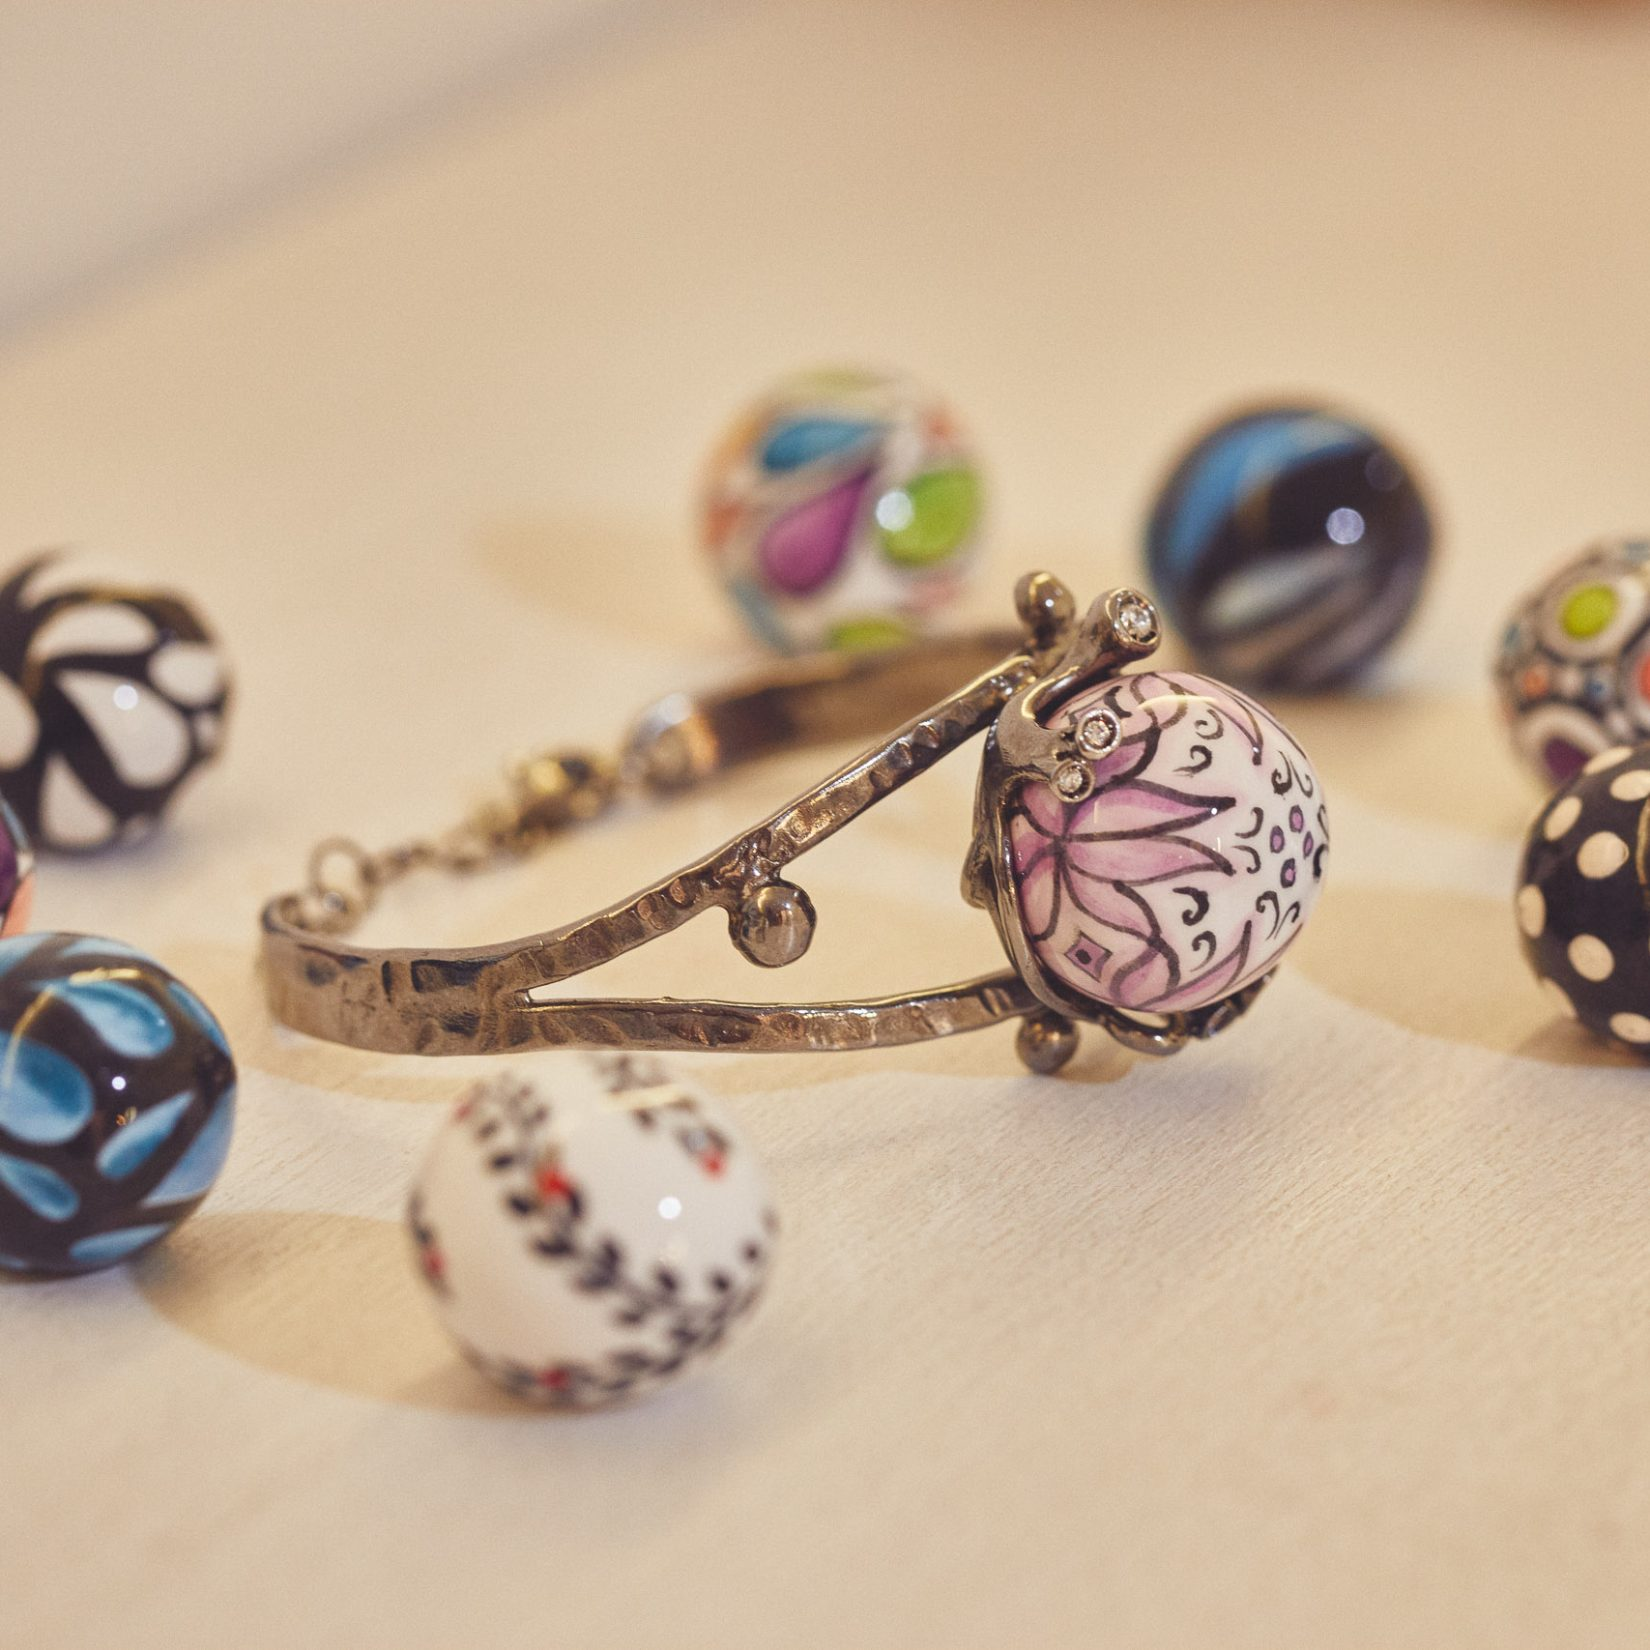 Anna Barola Italian Jewels - Articity